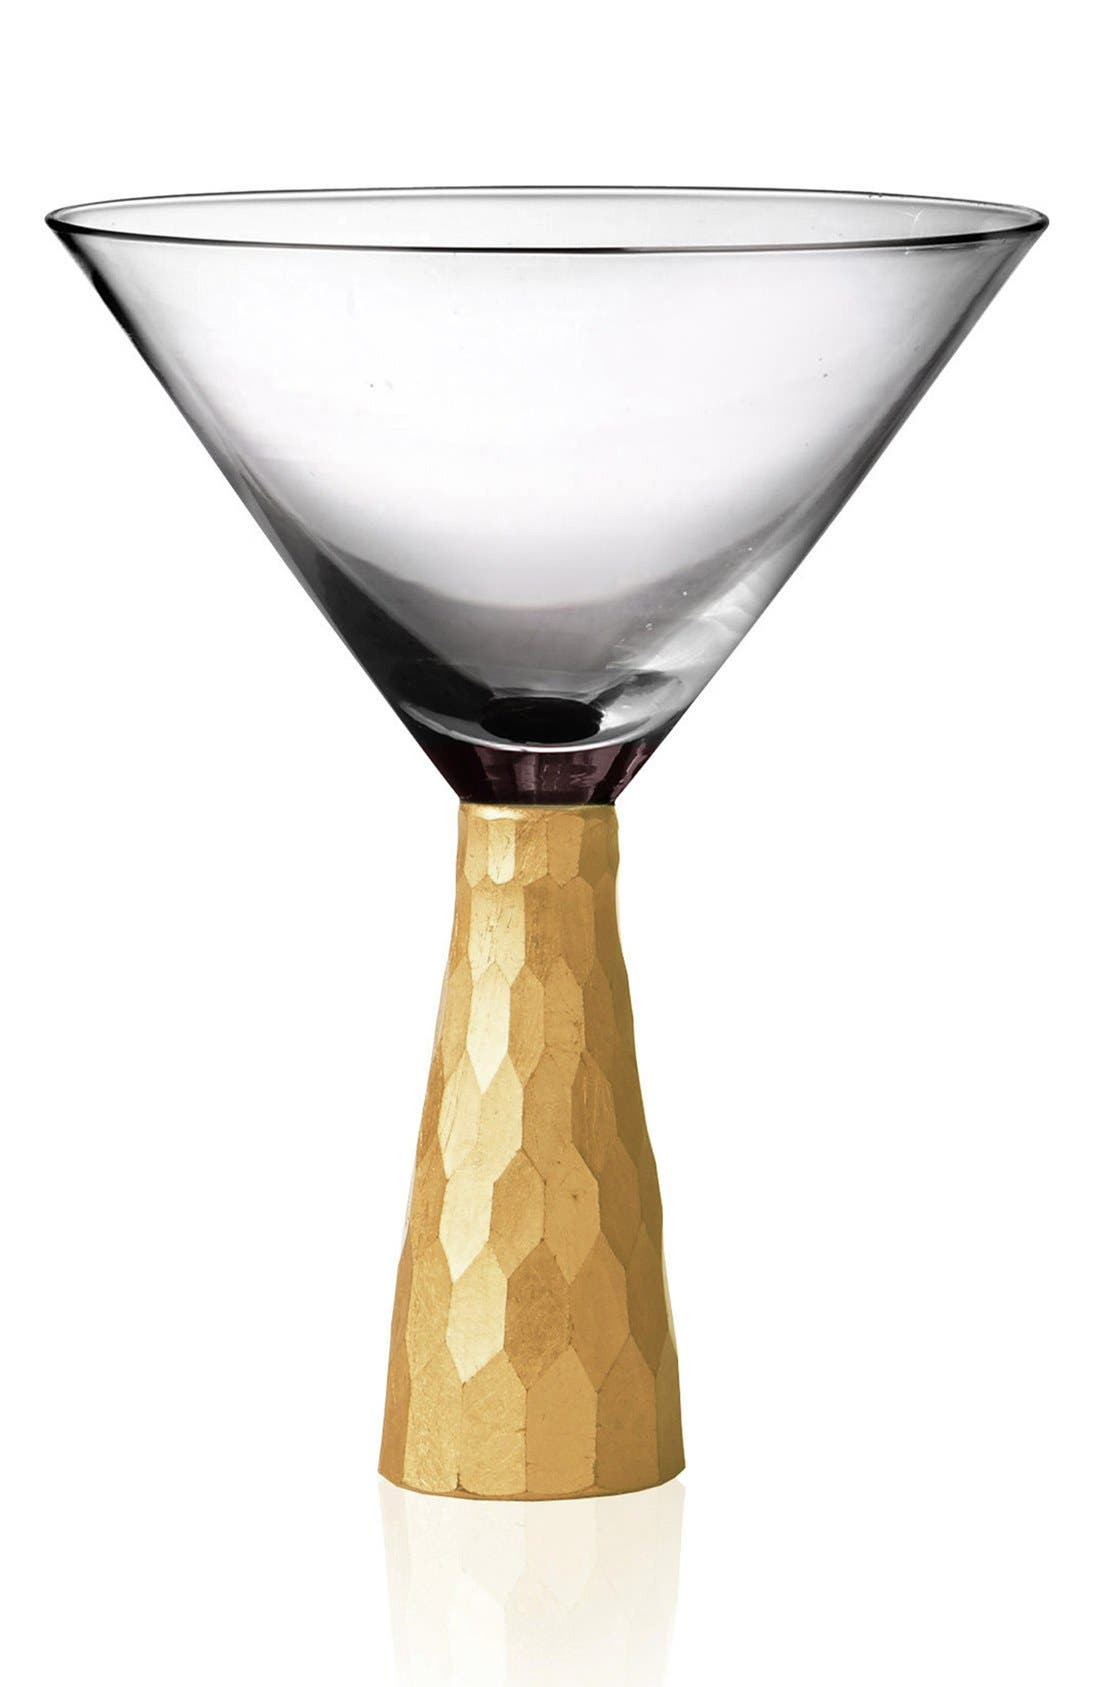 Alternate Image 1 Selected - American Atelier 'Daphne' Martini Glasses (Set of 4)